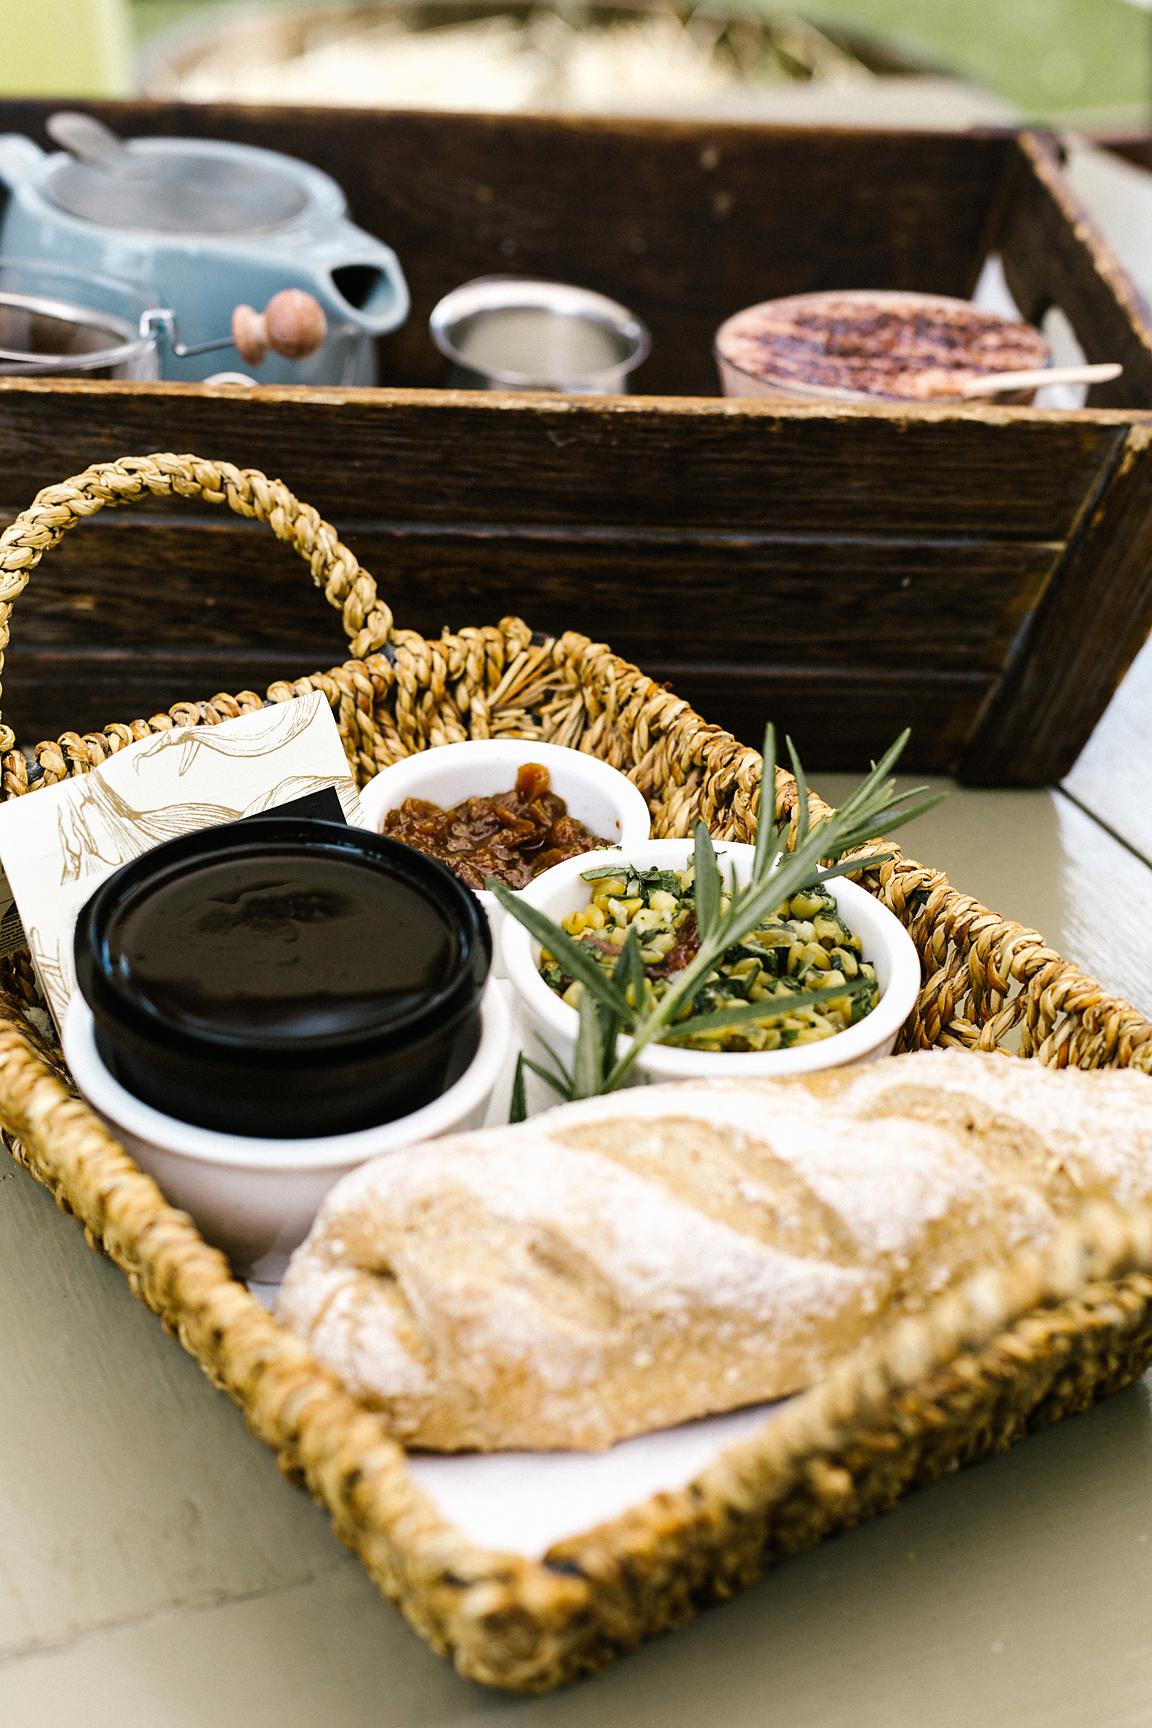 Pheasant Farm Chicken & Smoky Garlic Pate Picnic Basket